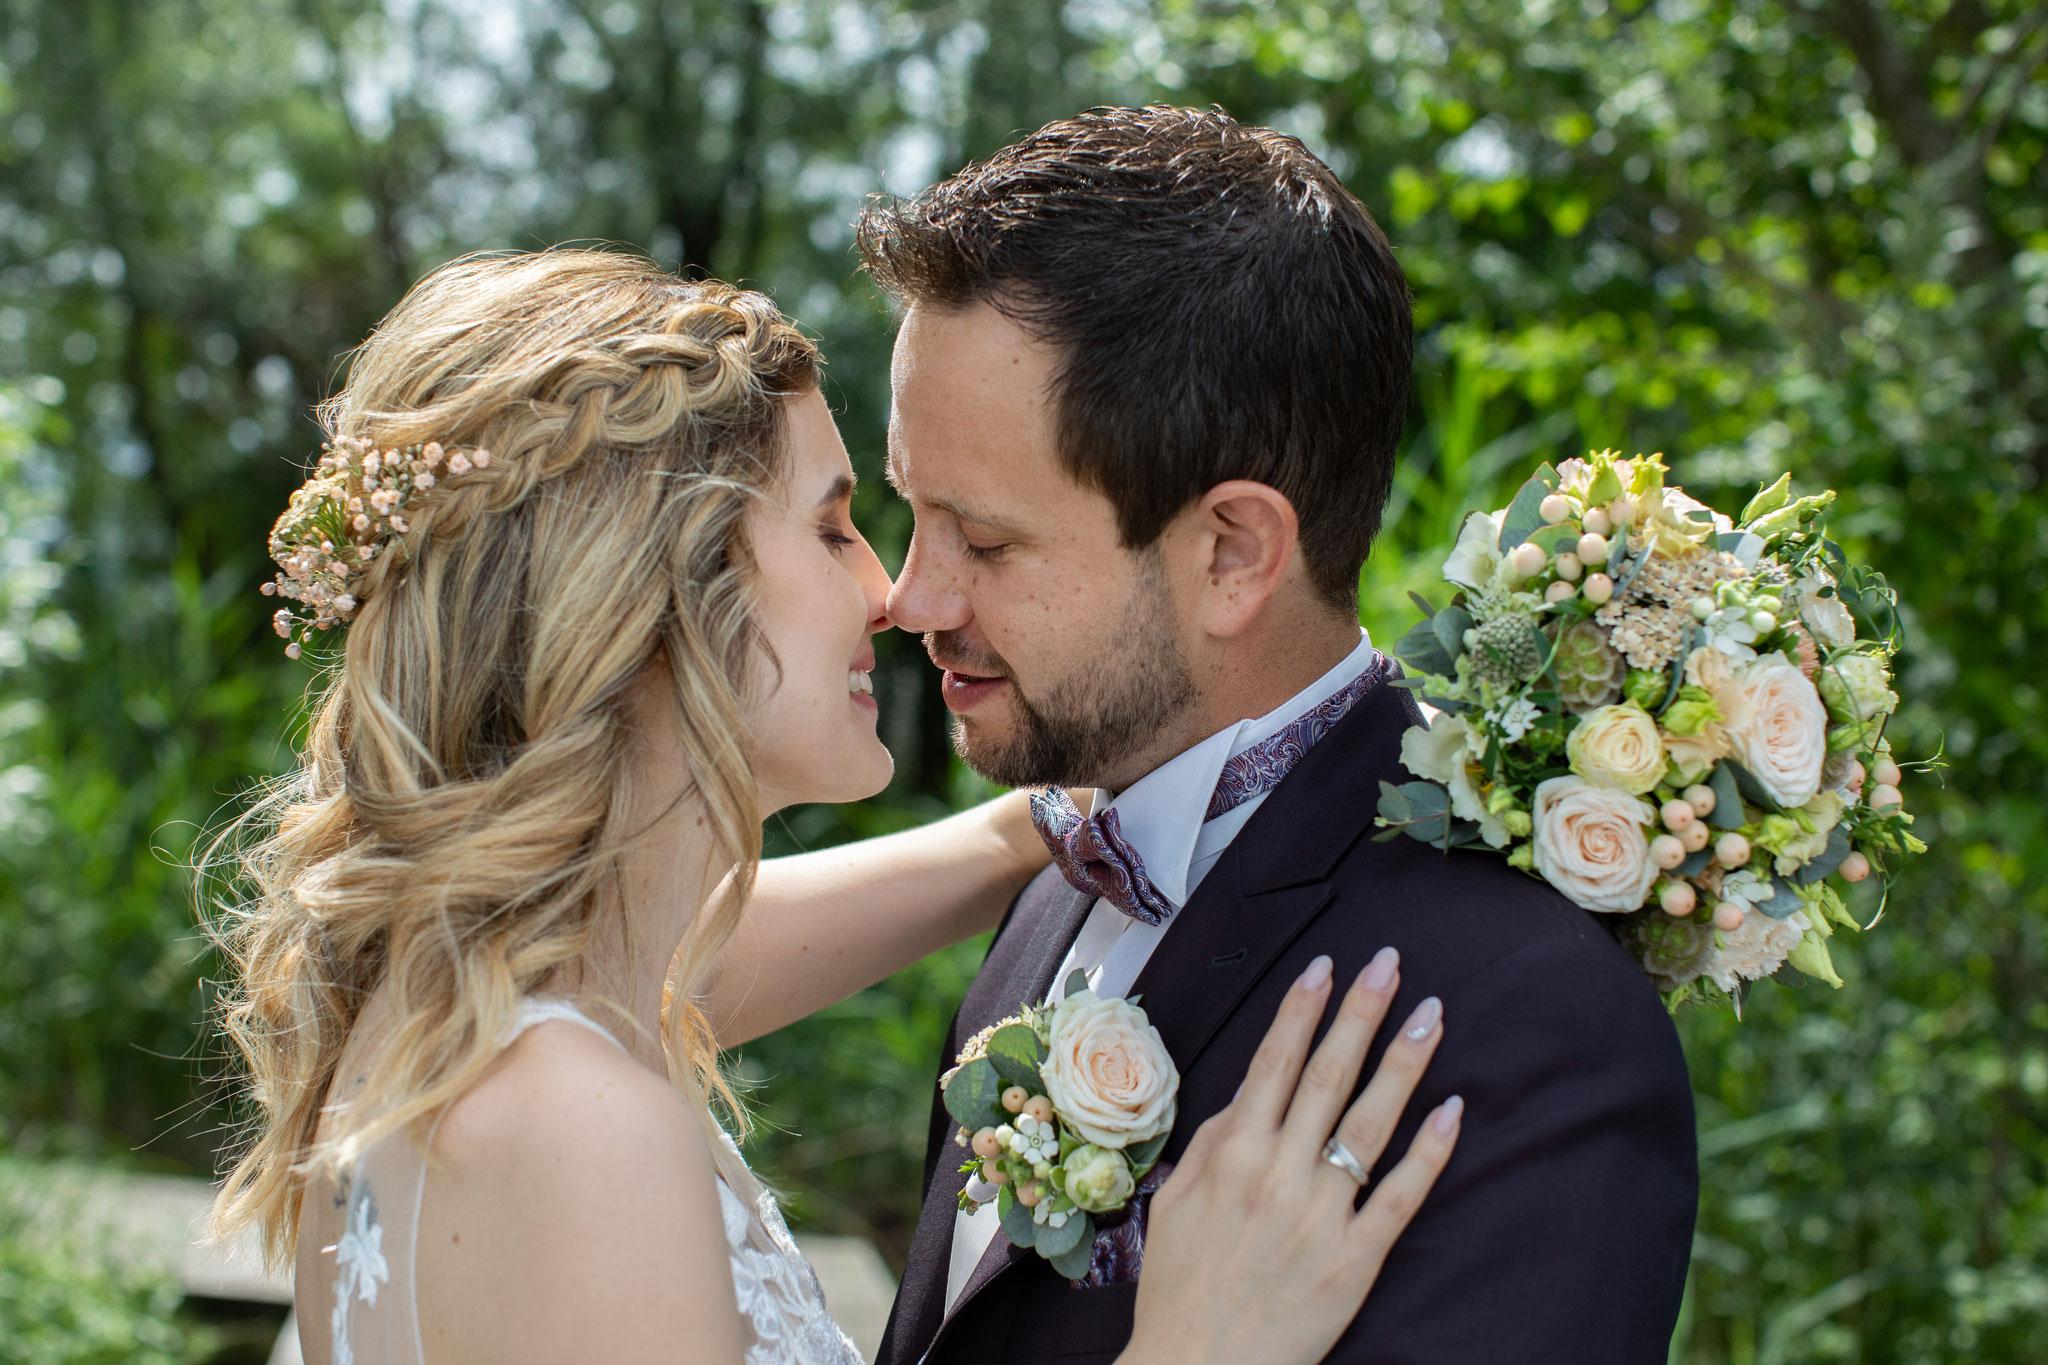 Braut 2021 Carina Airbrush und modernes Hairstyling